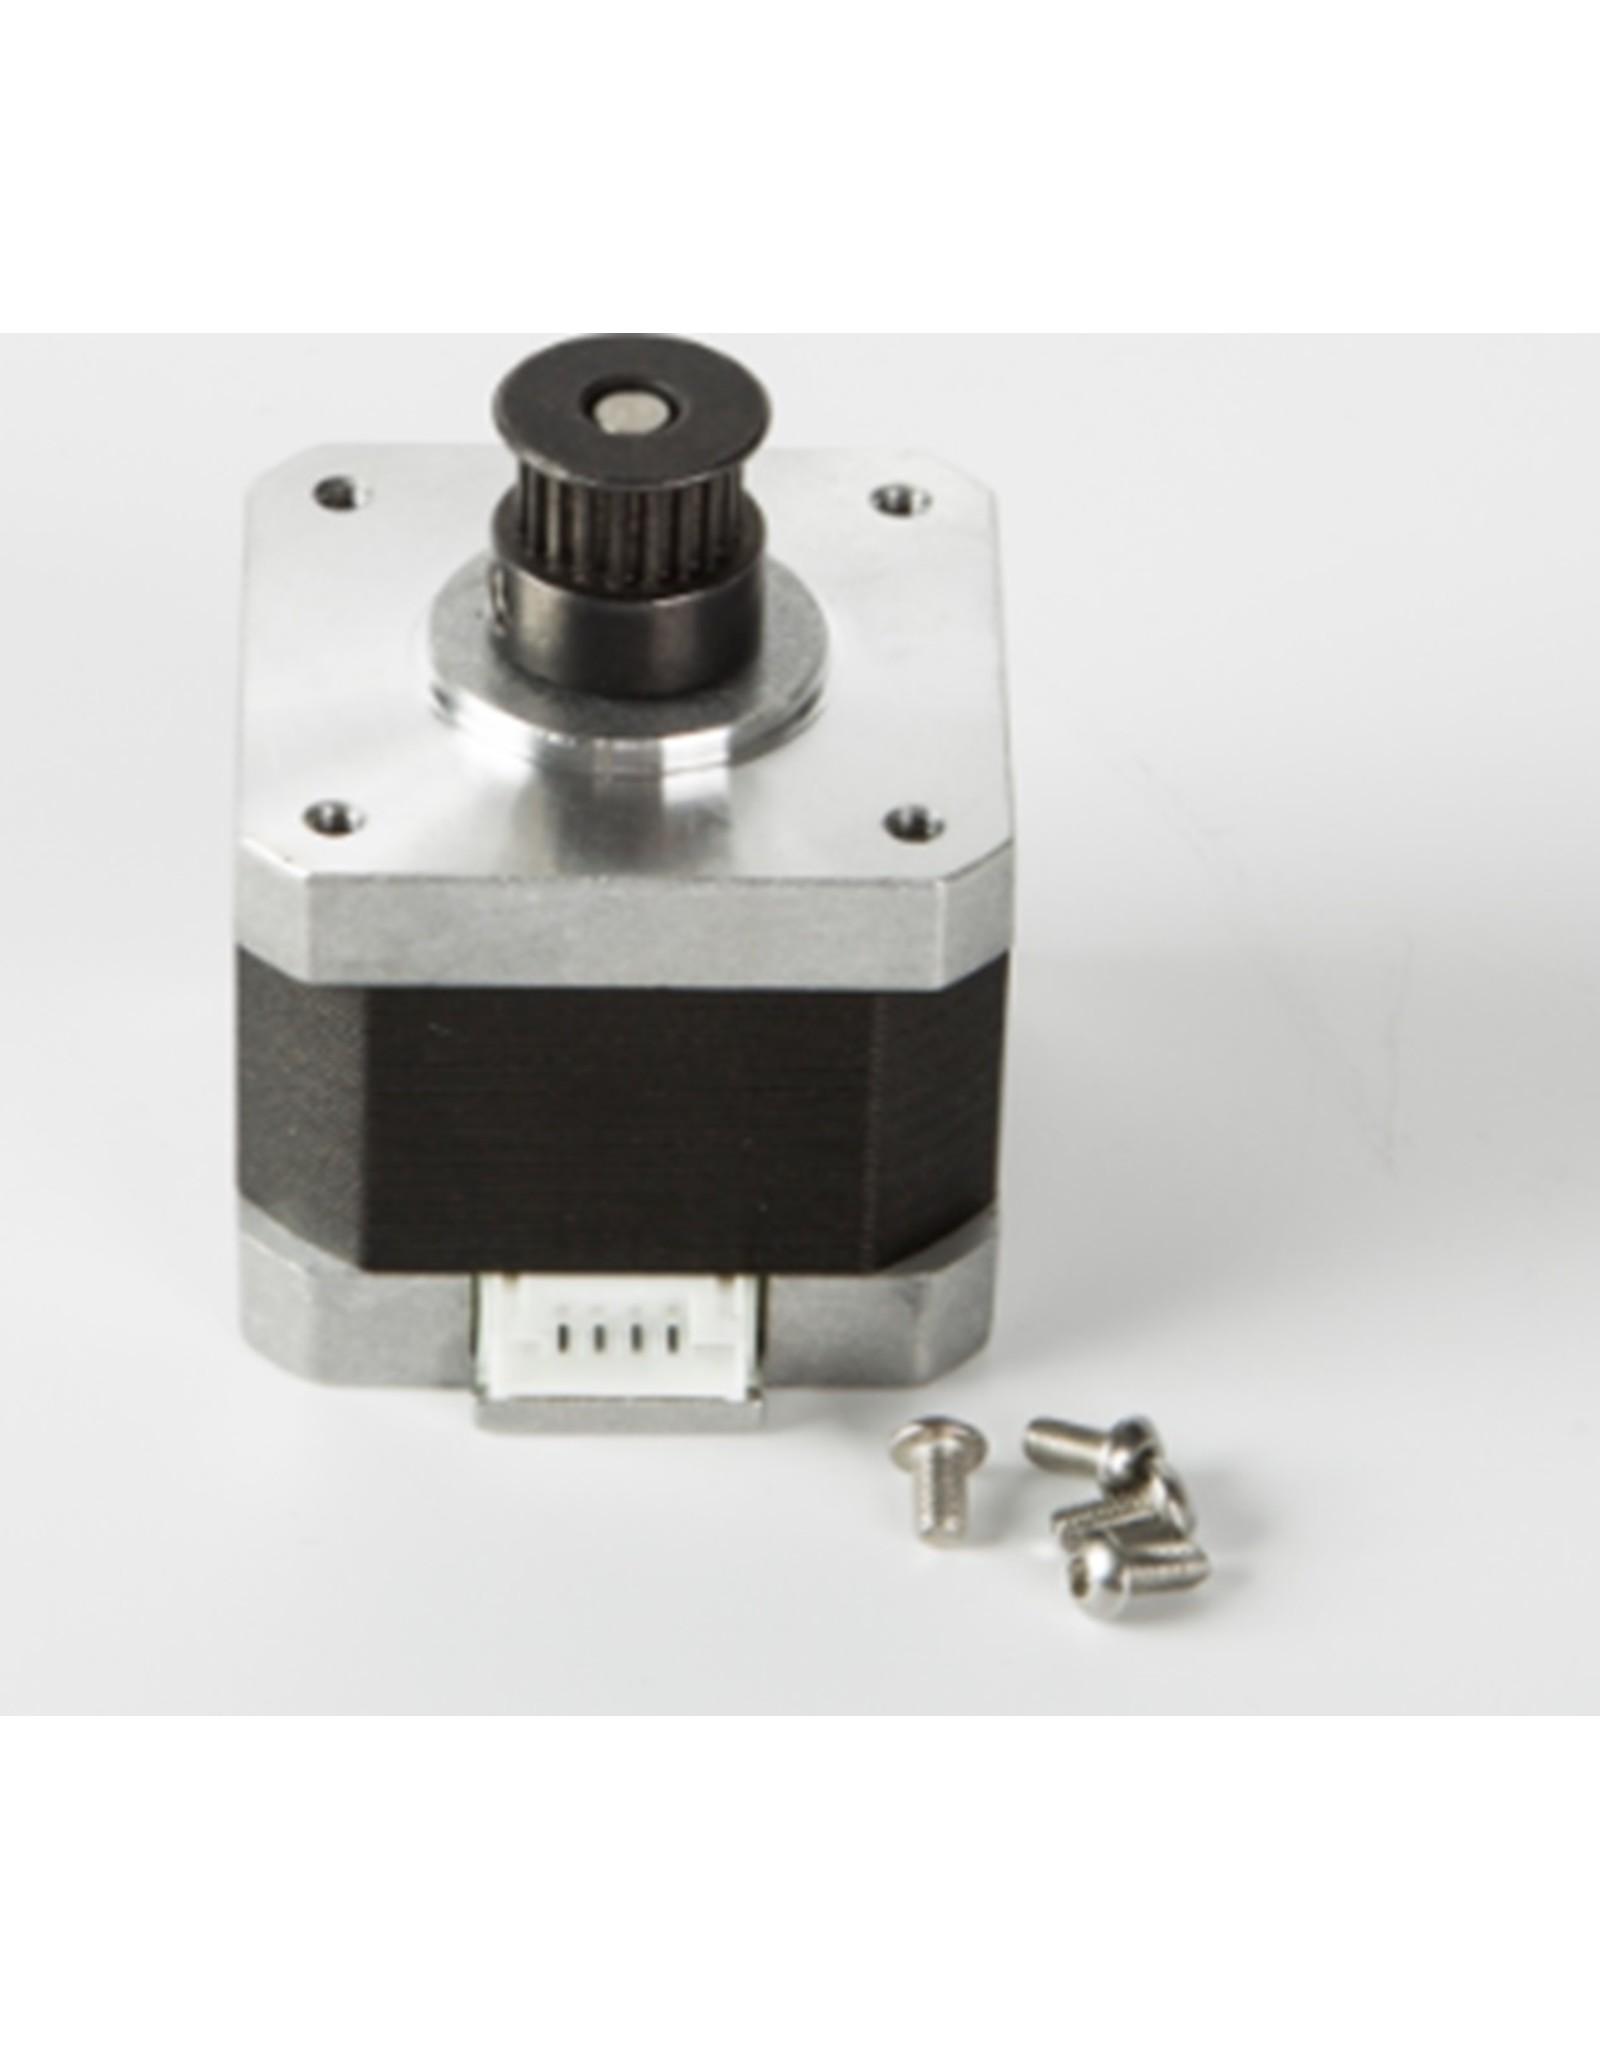 Creality/Ender Creality 3D CR10s Pro - Kit moteur axe Y